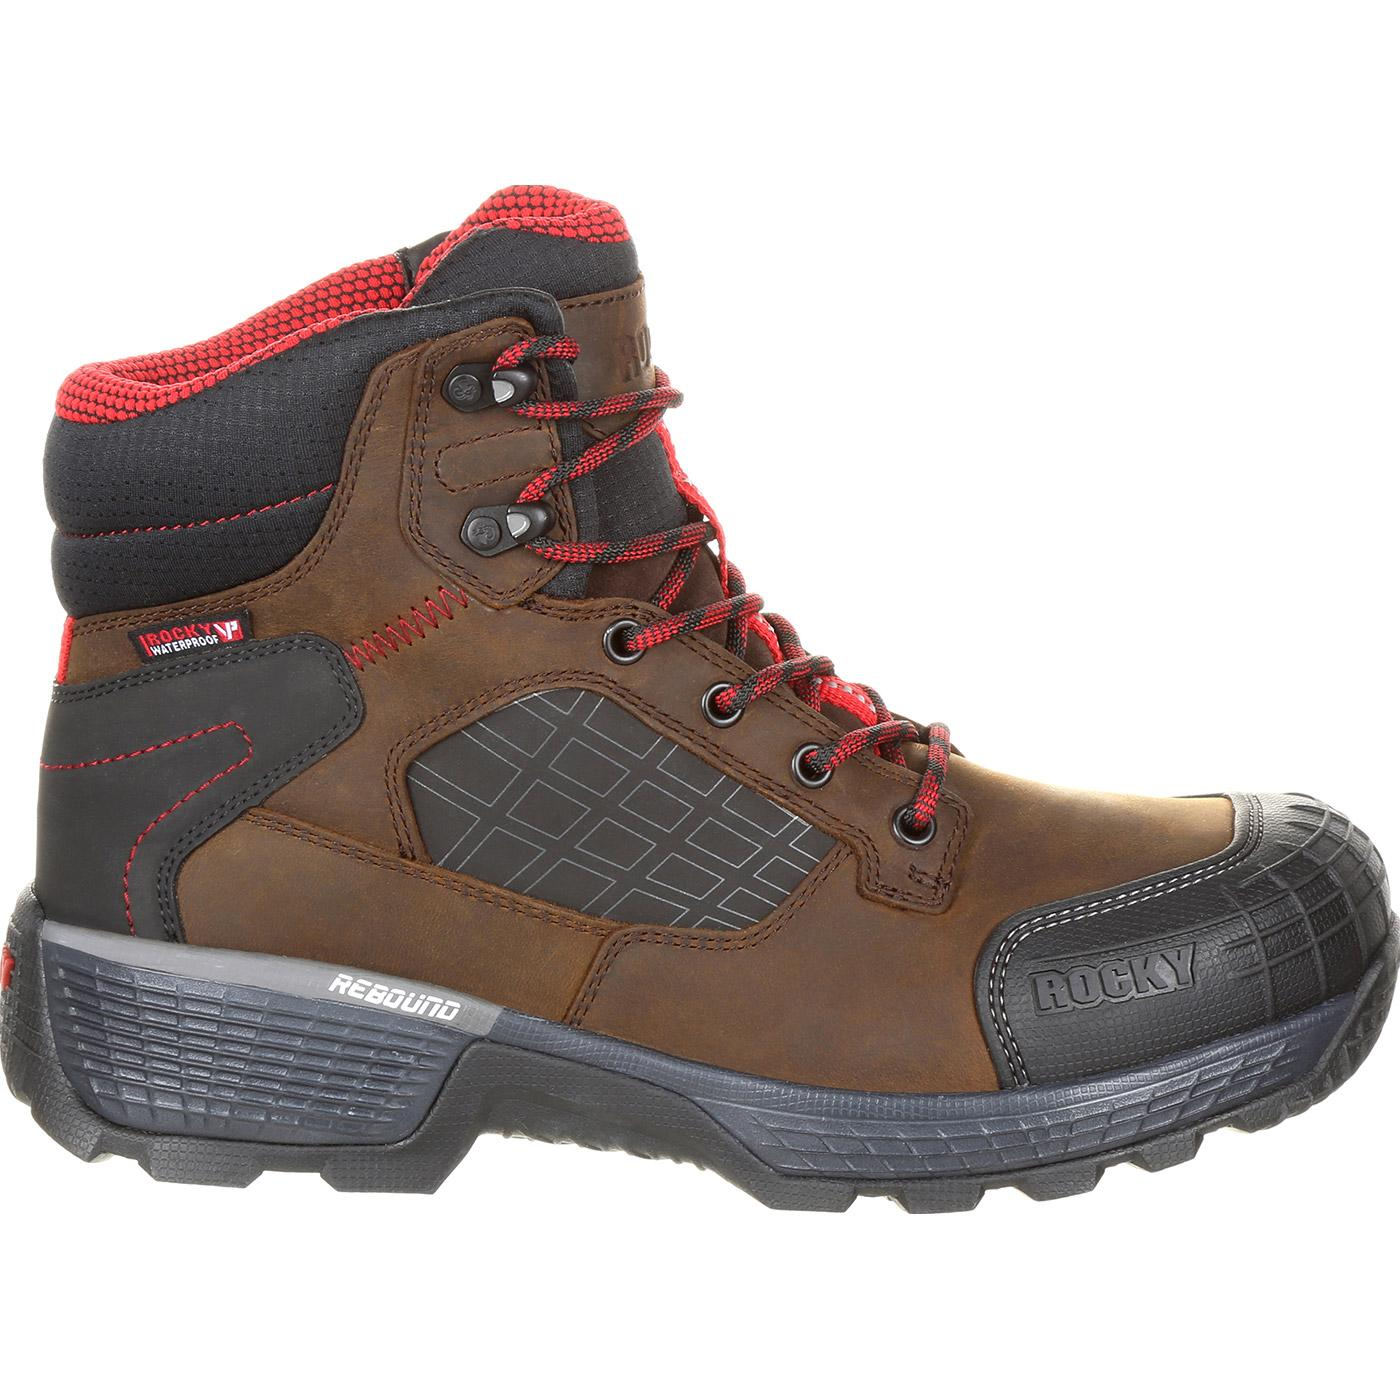 299d2cecea5 Rocky Treadflex Composite Toe Waterproof Work Boot